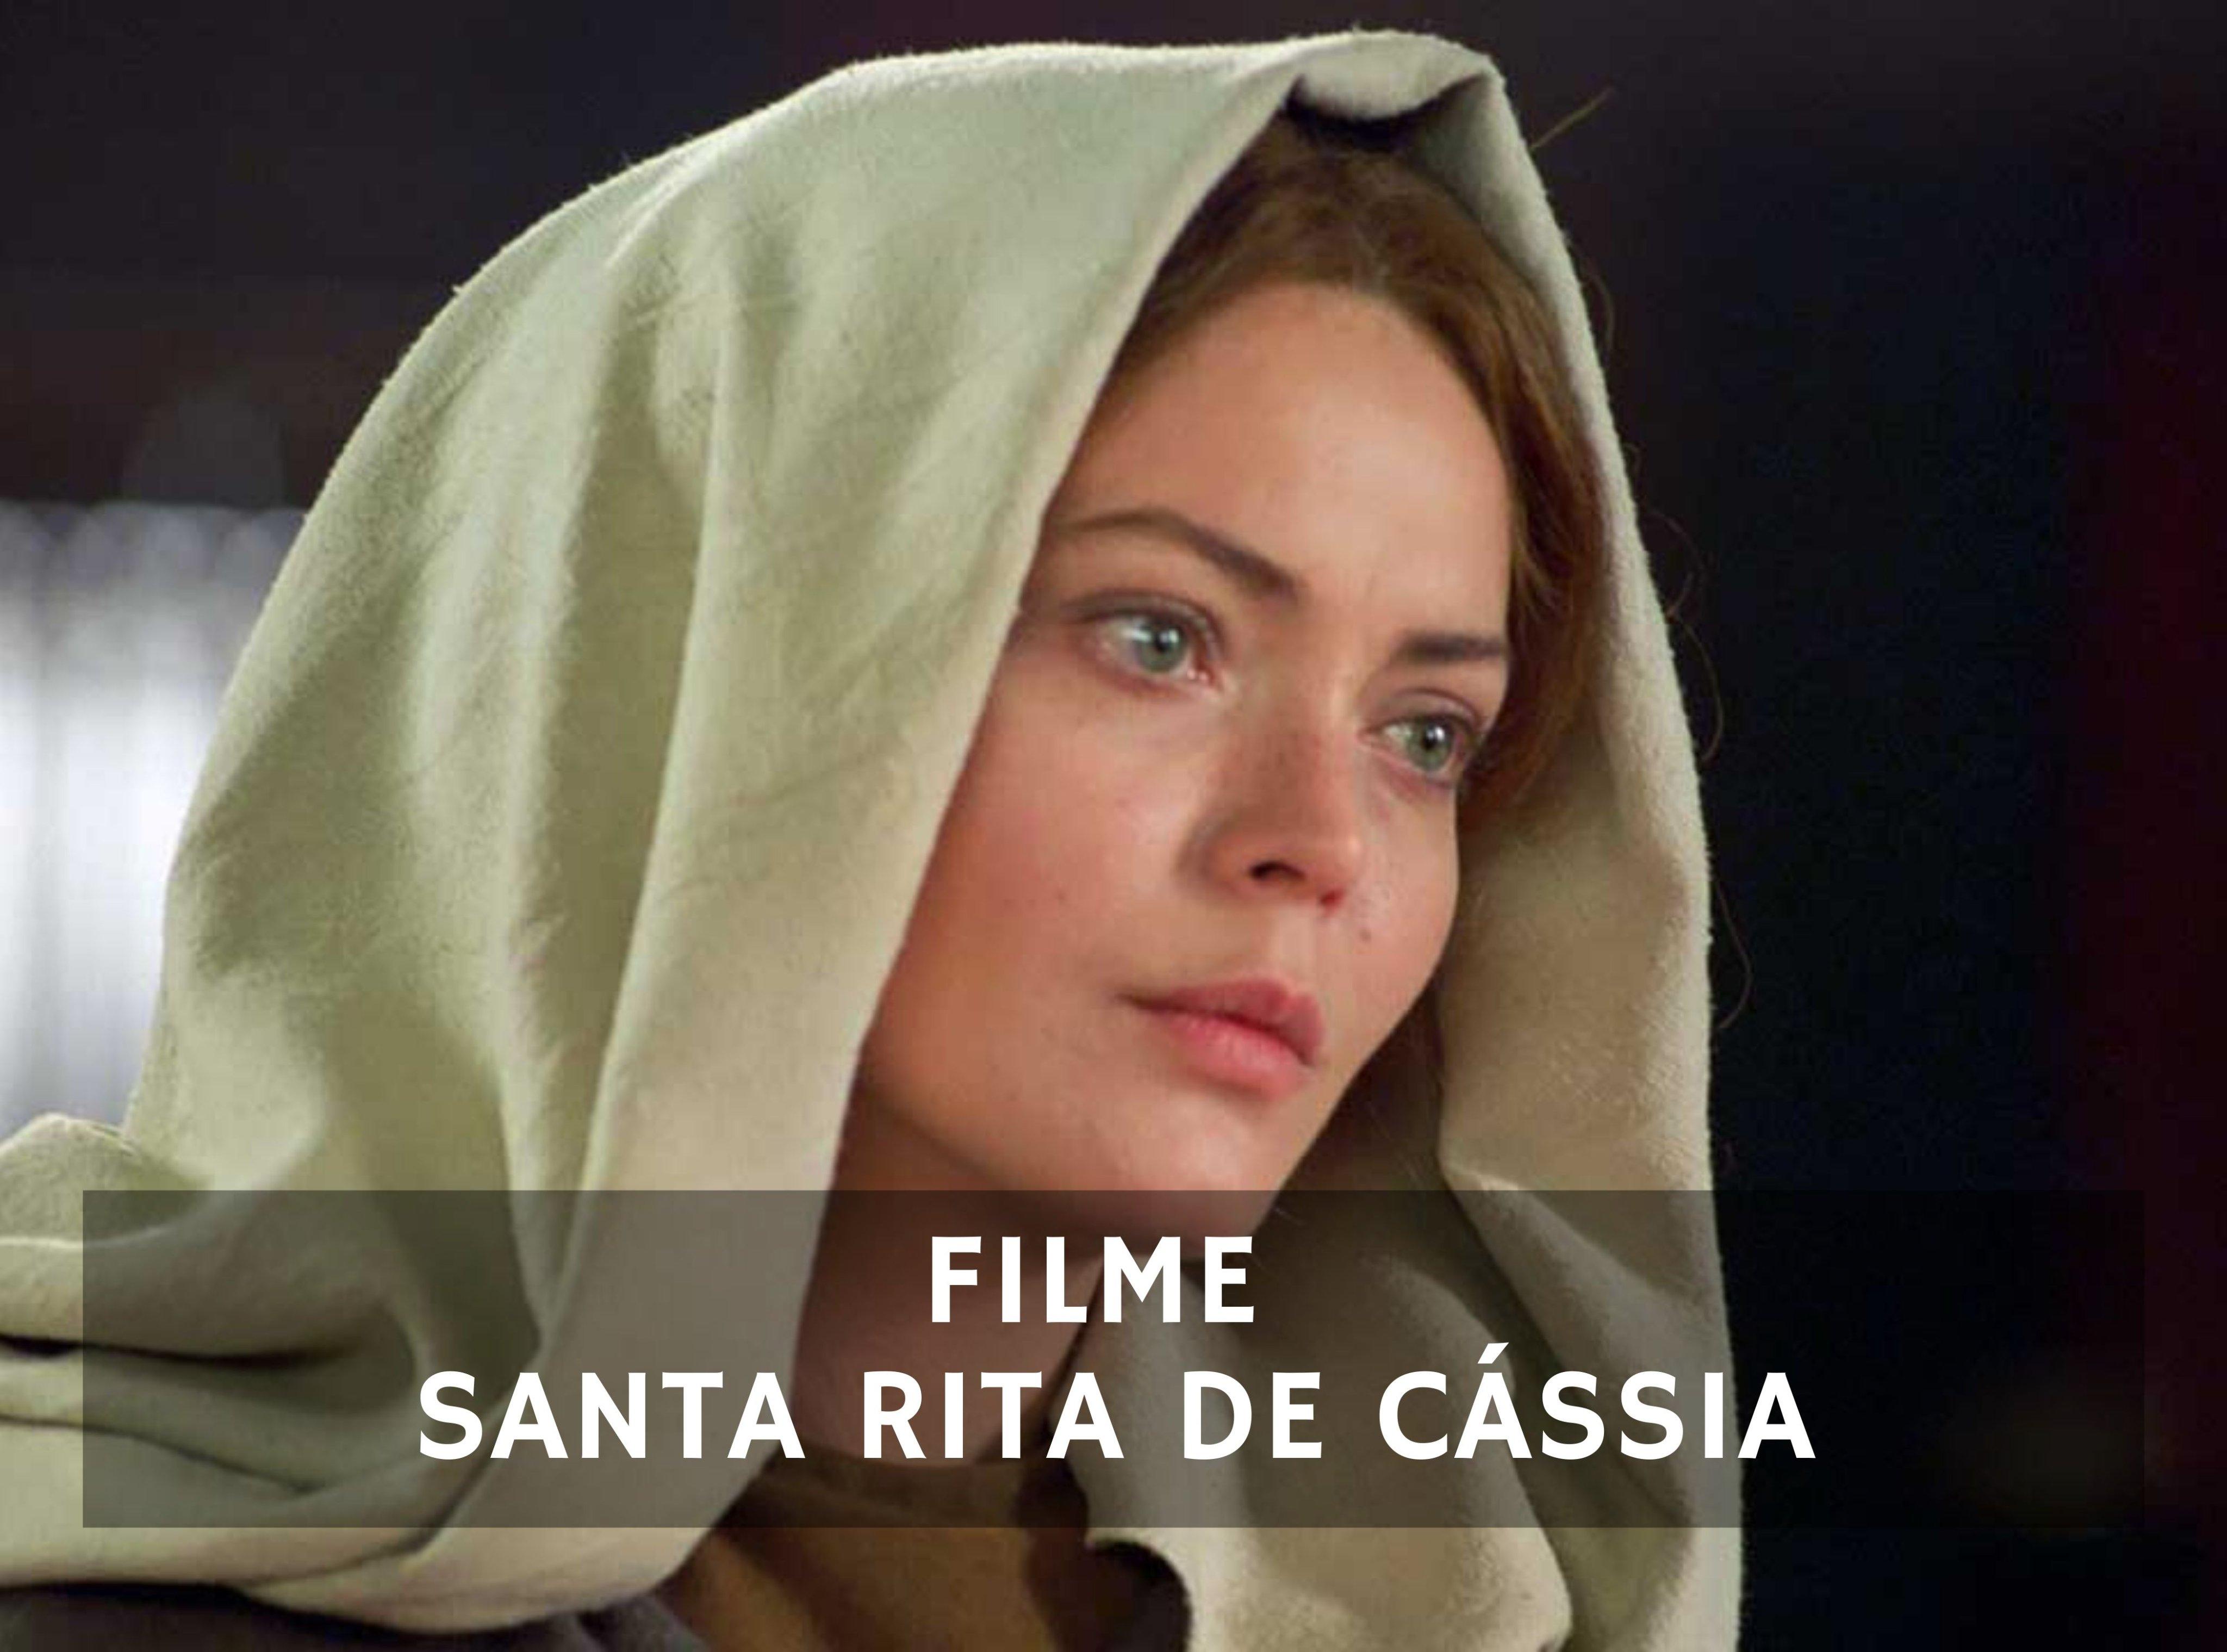 Filme de Santa Rita de Cássia